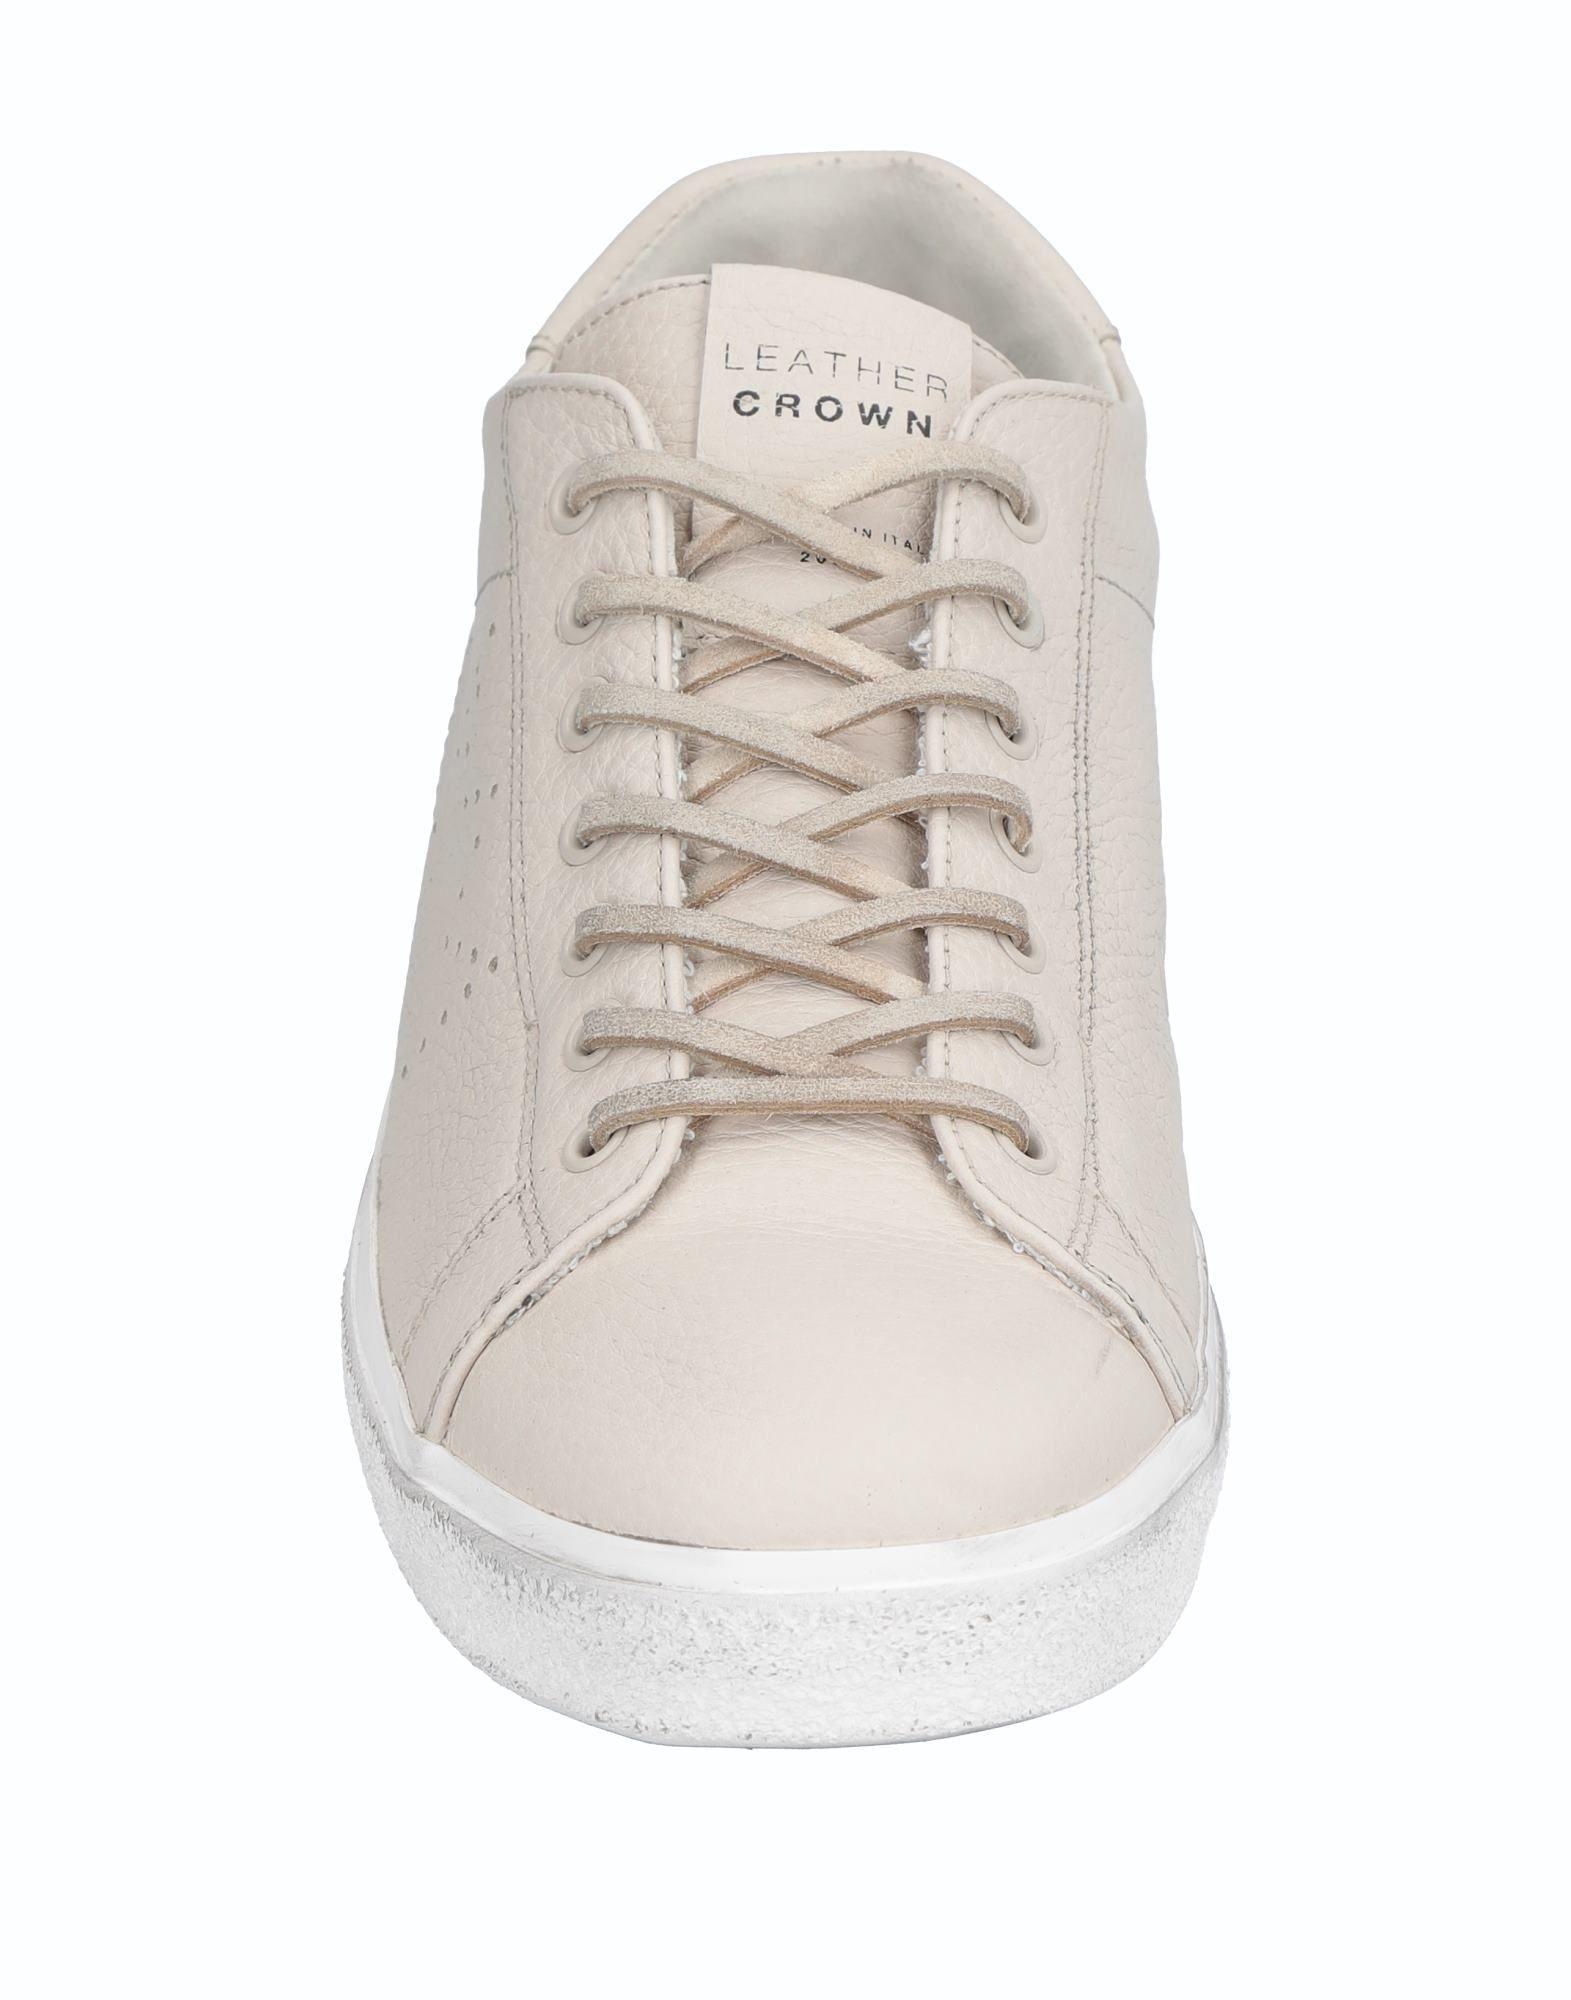 Leather Crown Crown Leather Sneakers Herren  11537253OC 47188f